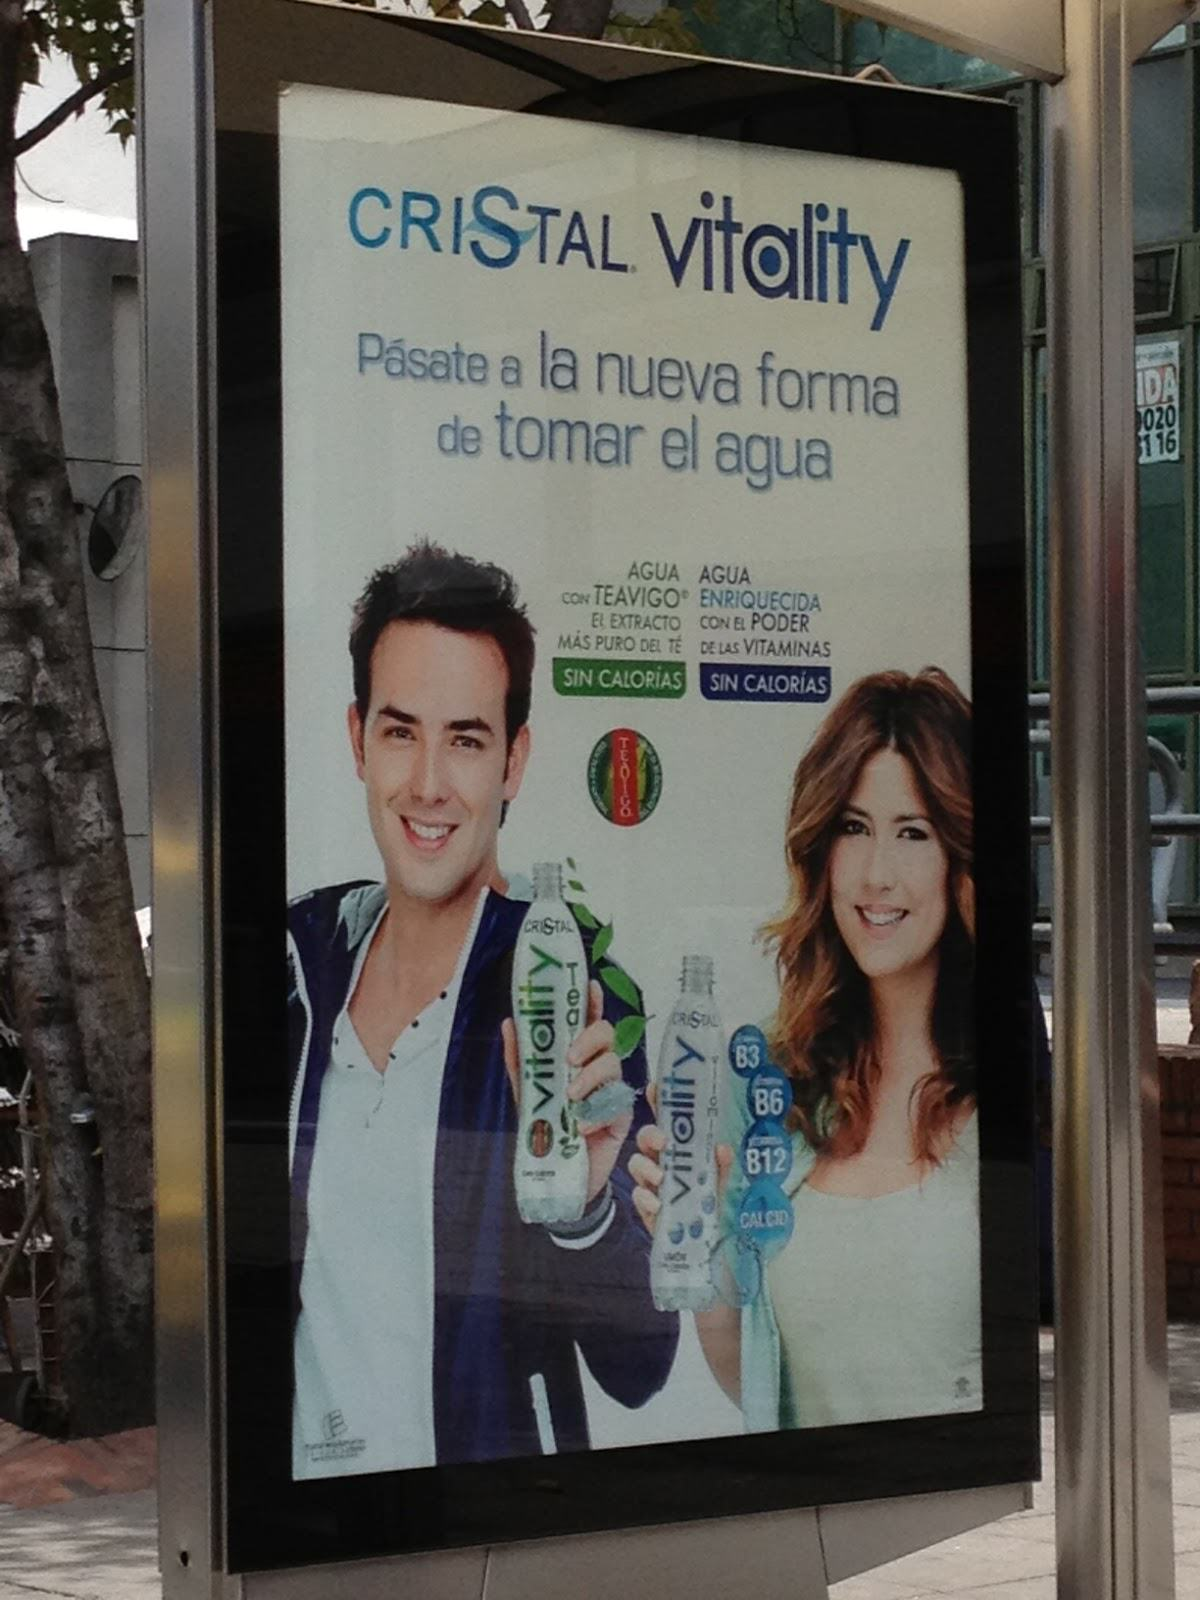 Cristal Vitality